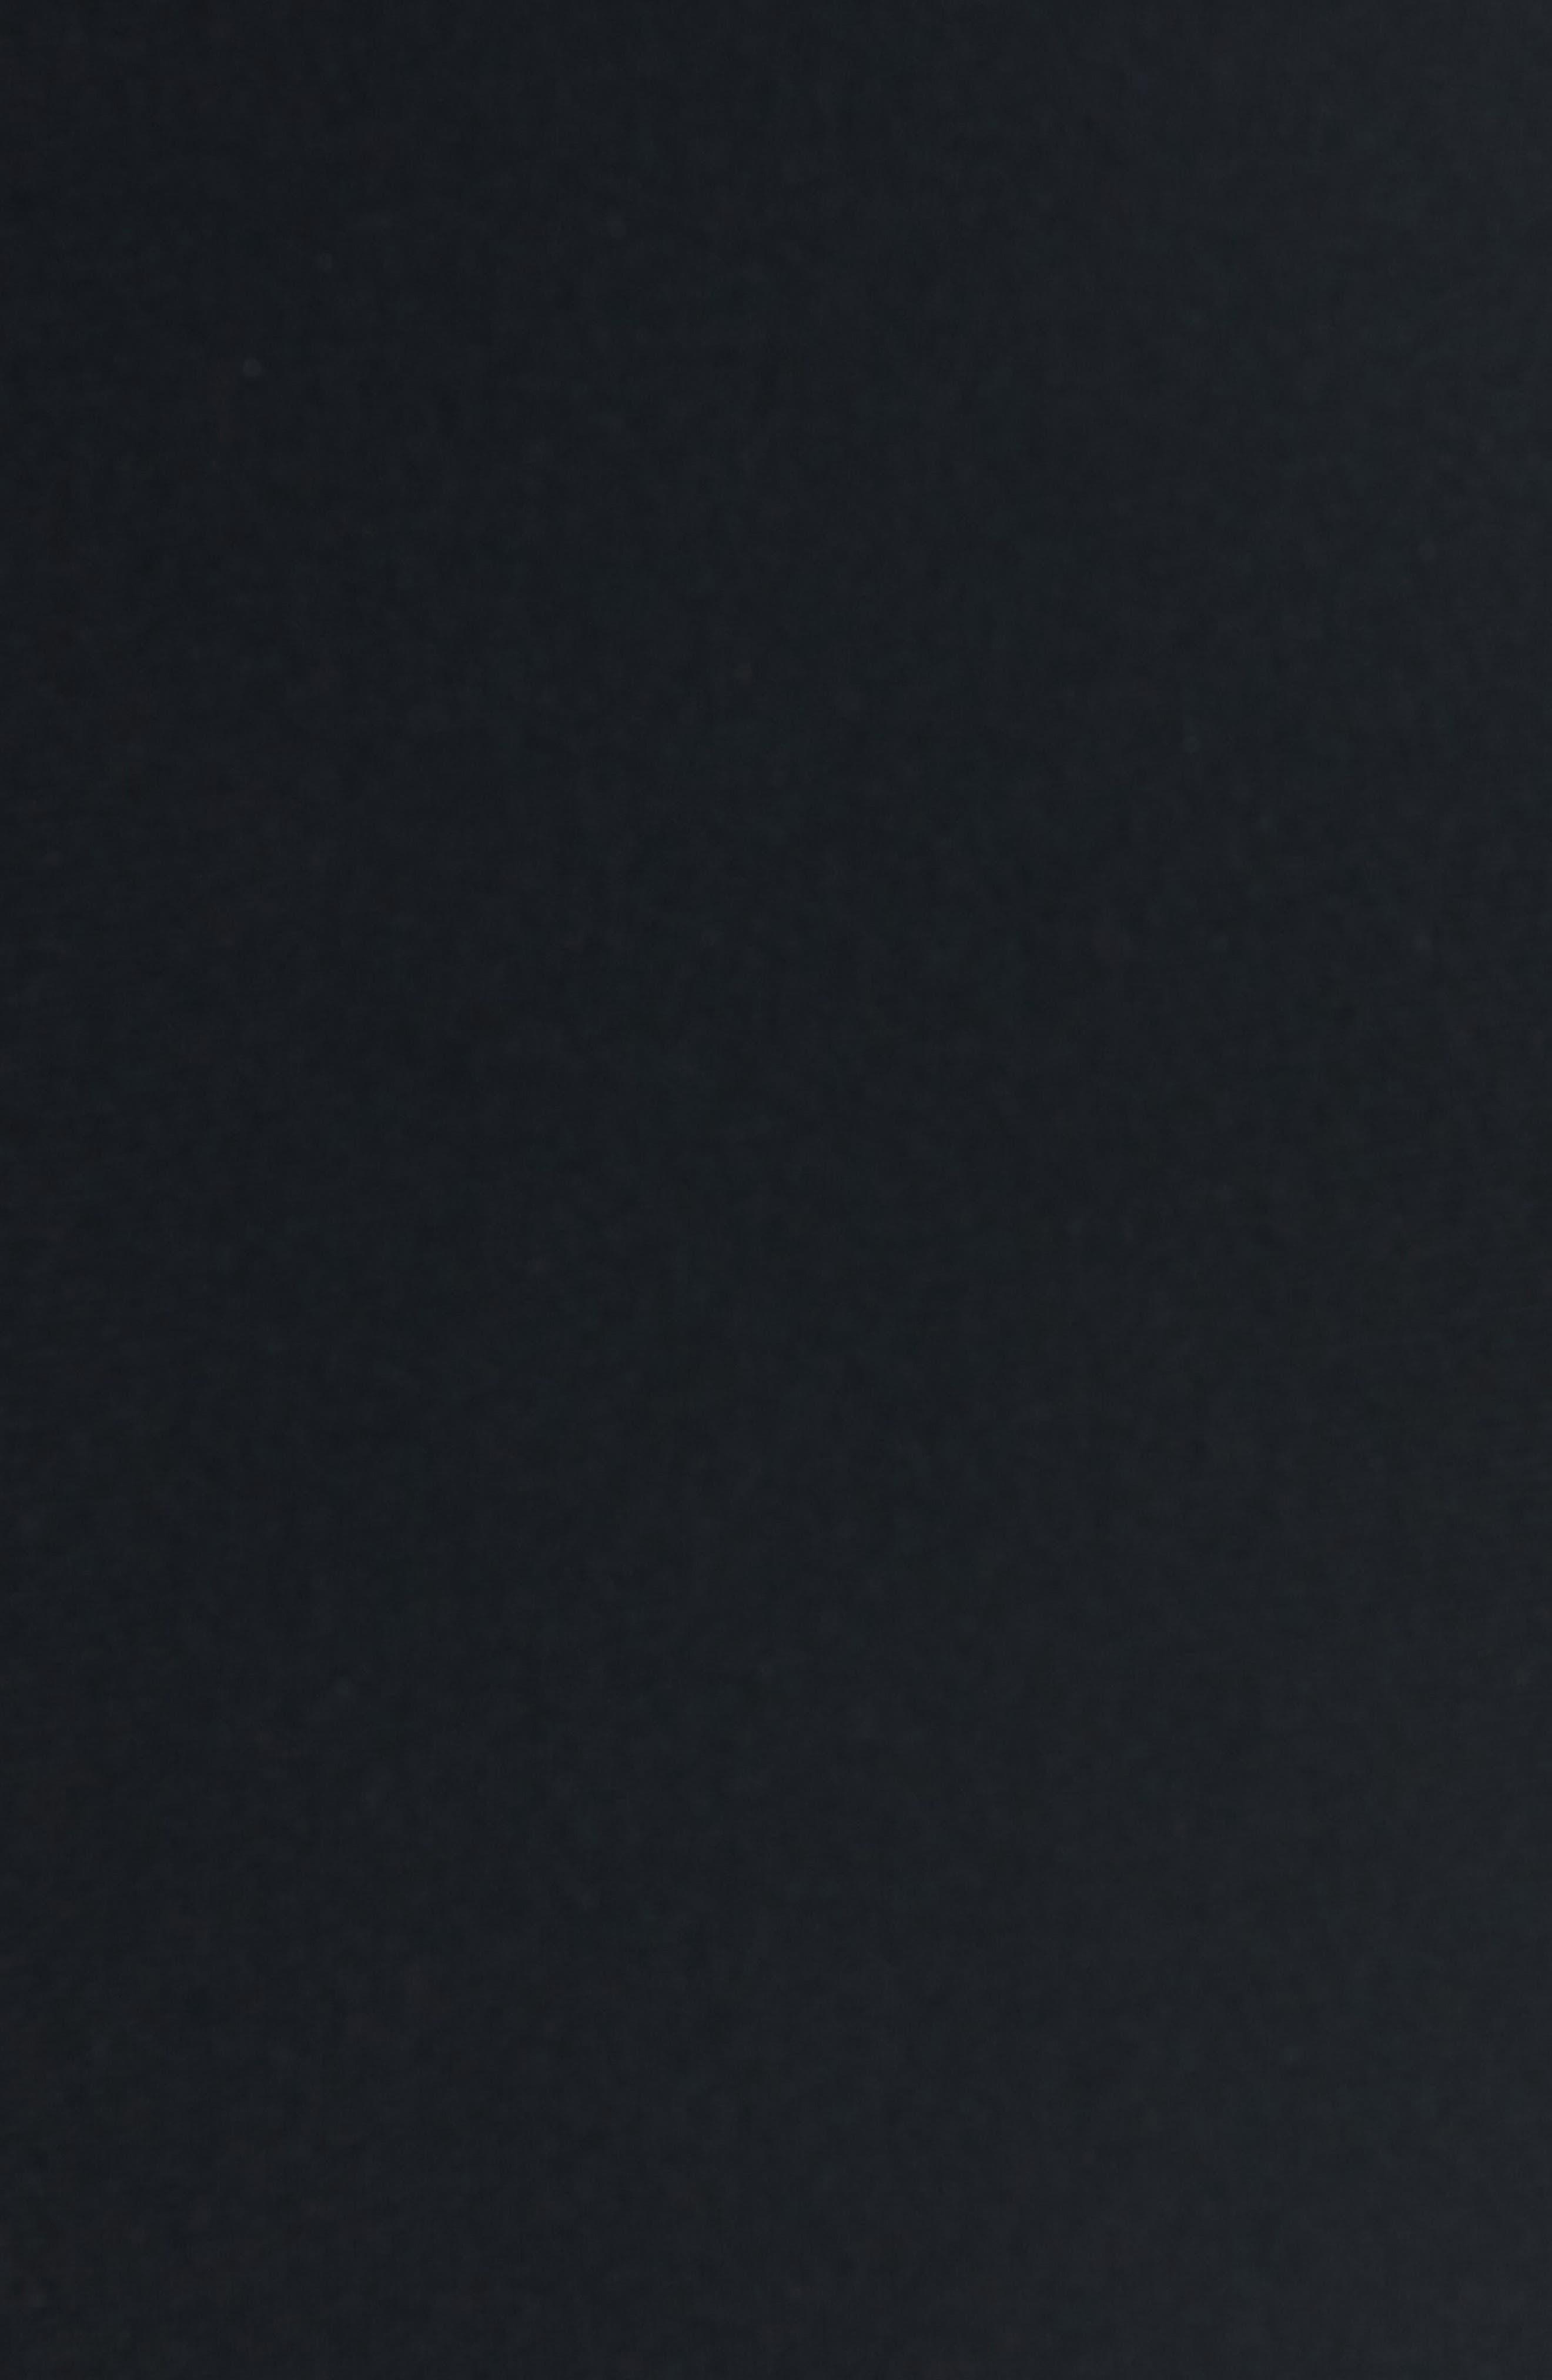 Serge Slim Pants,                             Alternate thumbnail 5, color,                             BLACK